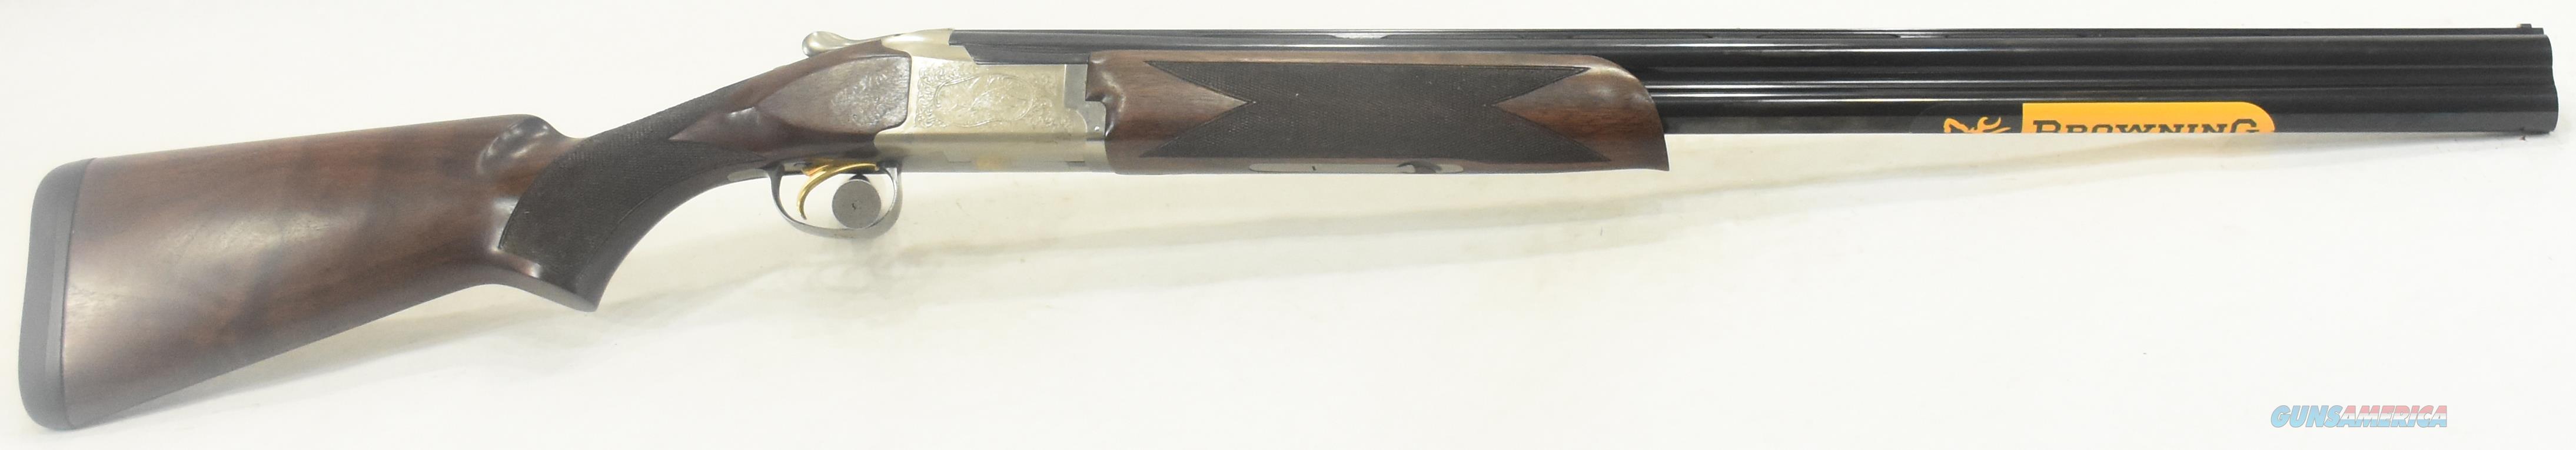 Citori 725 Feather Walnut 12Ga 28-3In 0135663004  Guns > Shotguns > Browning Shotguns > Over Unders > Citori > Hunting